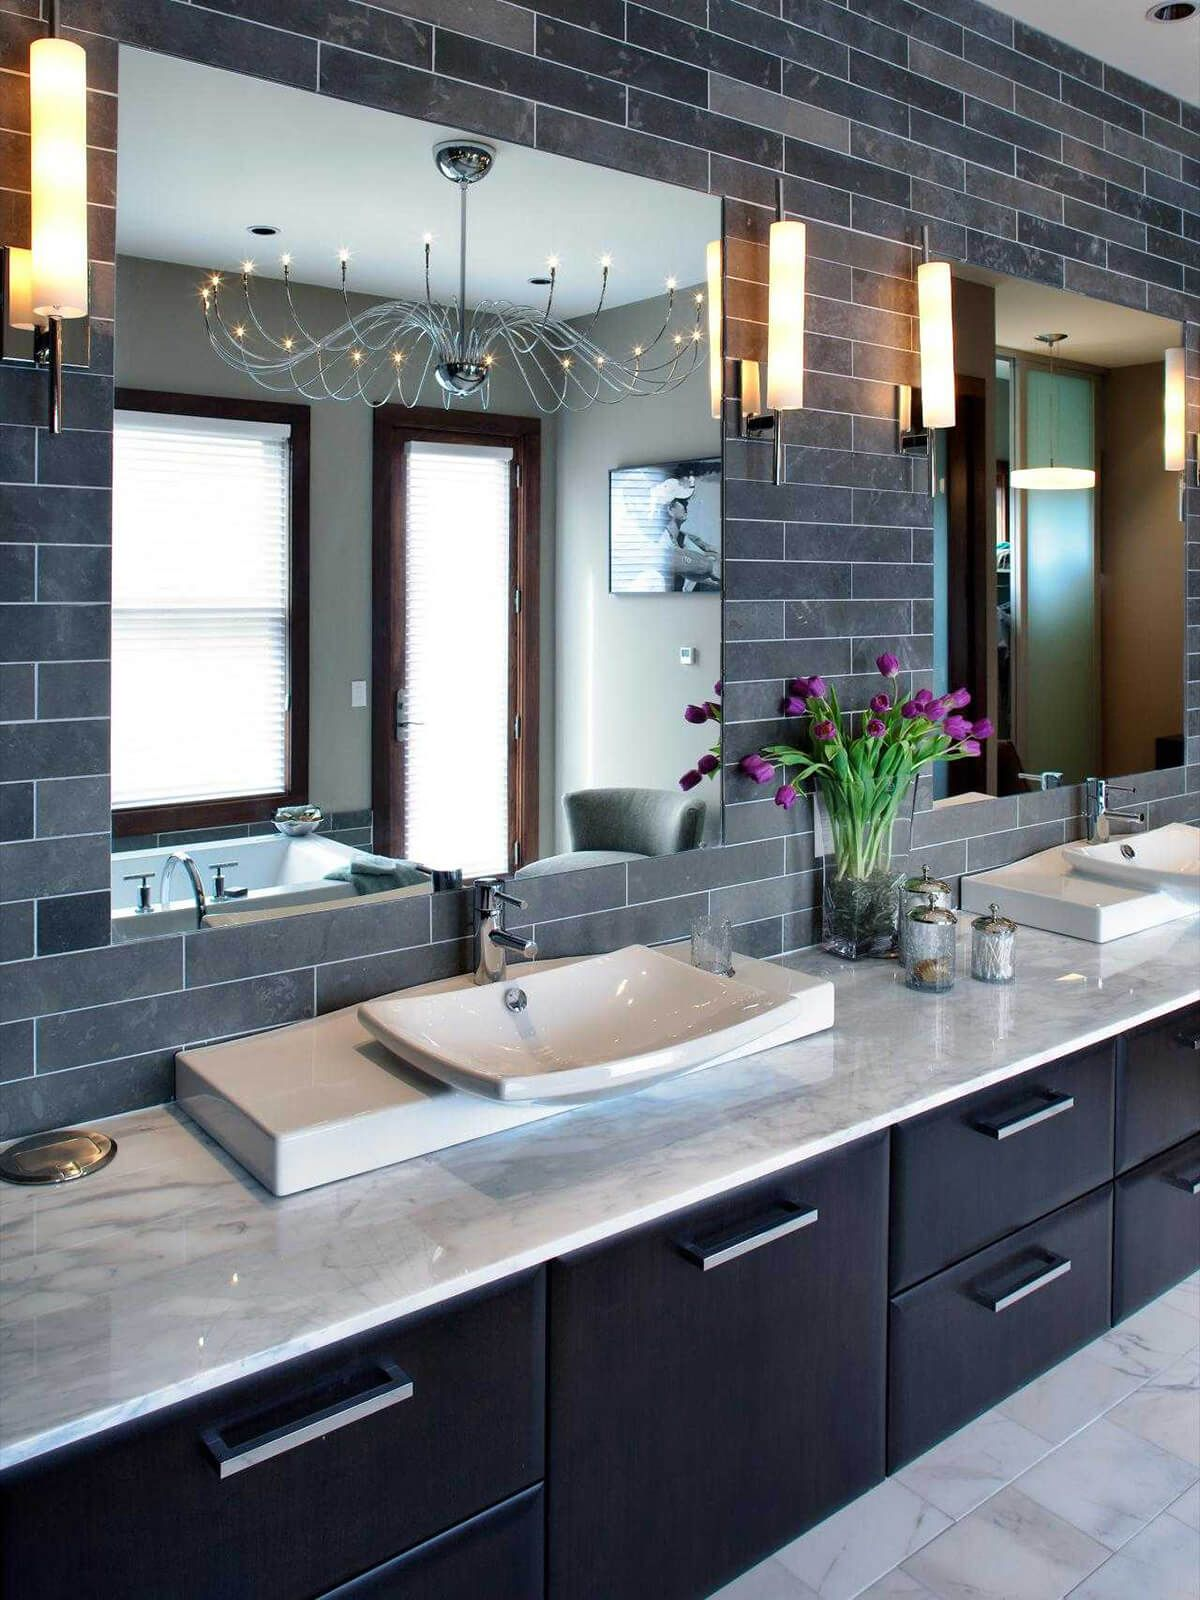 25 Inspiring Bathroom Sink Ideas To Add Style And Color To Your Bathroom Modern Master Bathroom Contemporary Bathrooms Bathroom Color Schemes